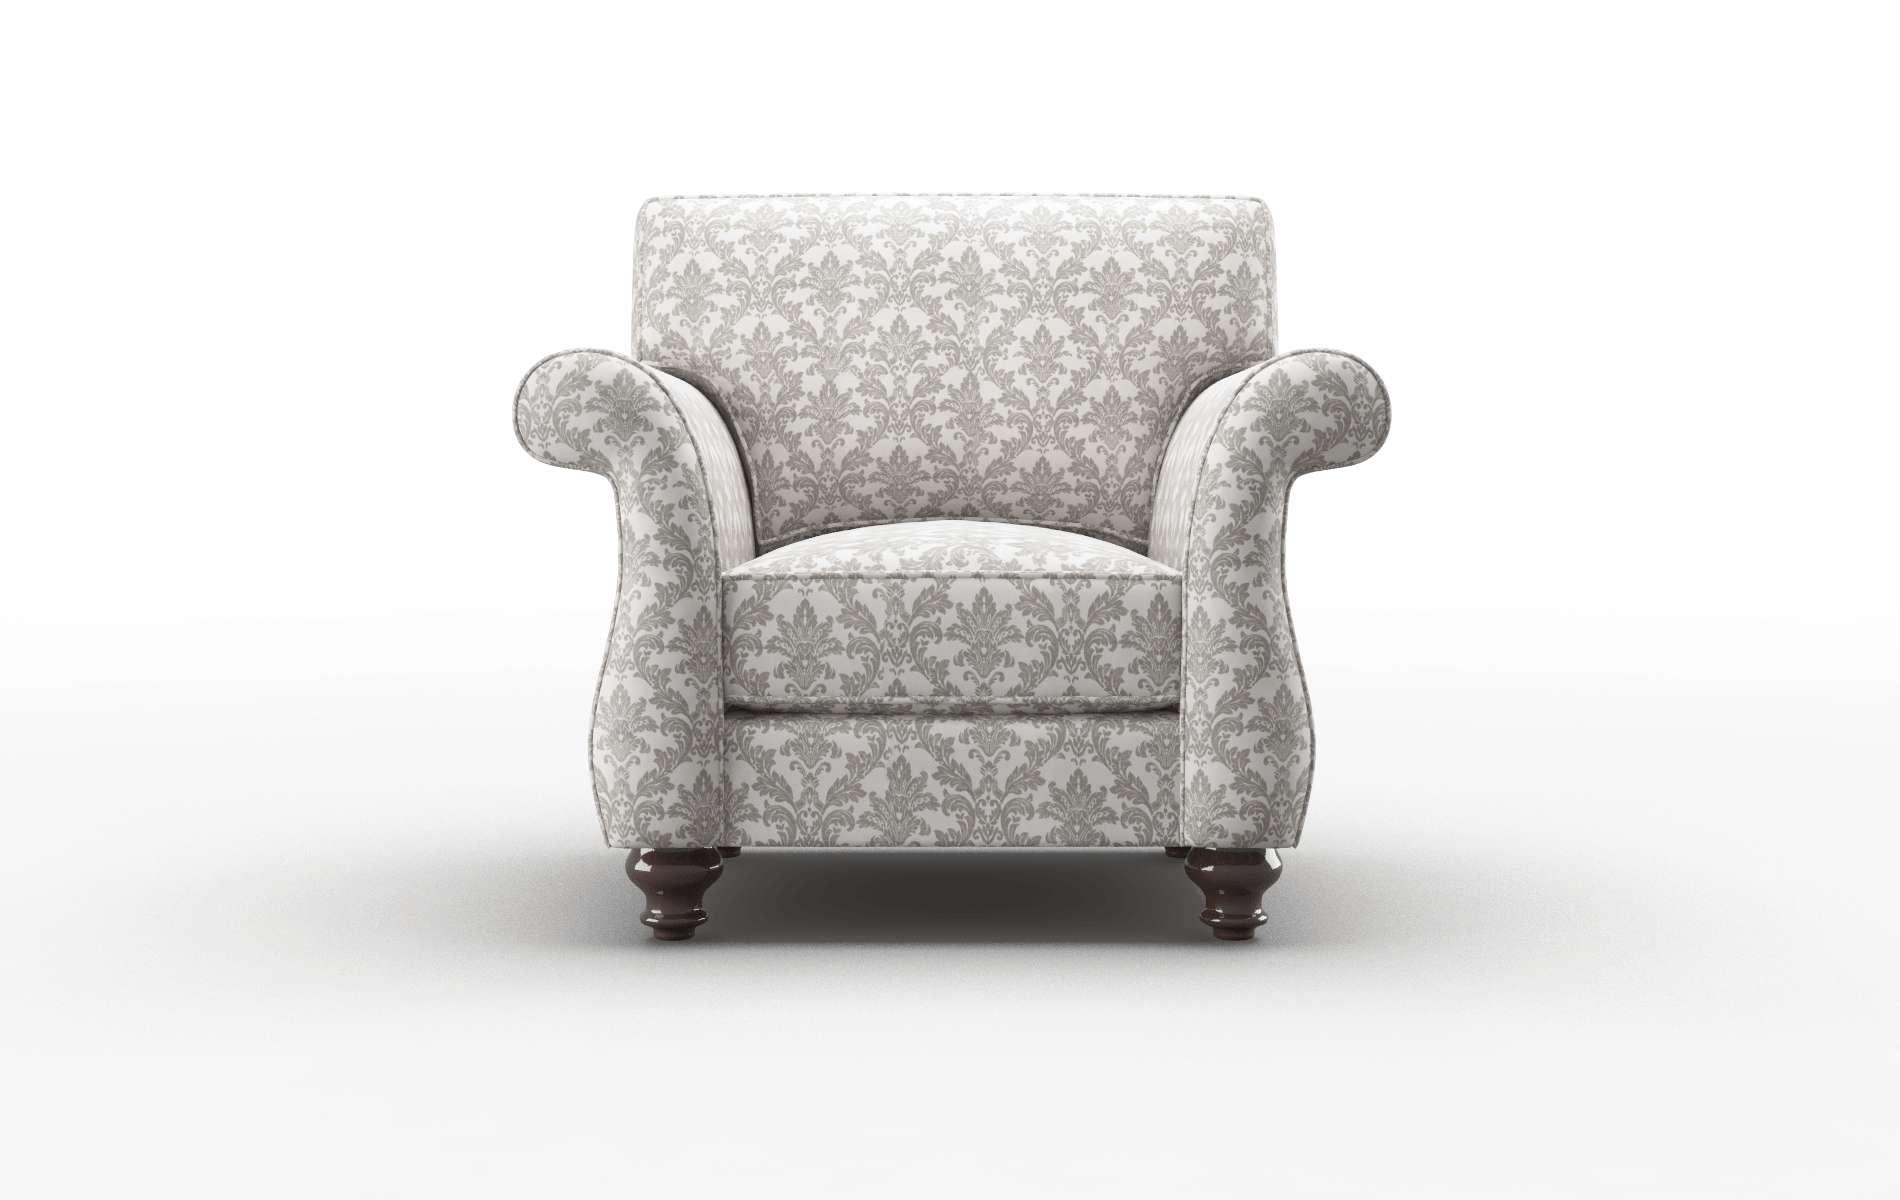 Pisa Bergamo Dove Chair espresso legs 1